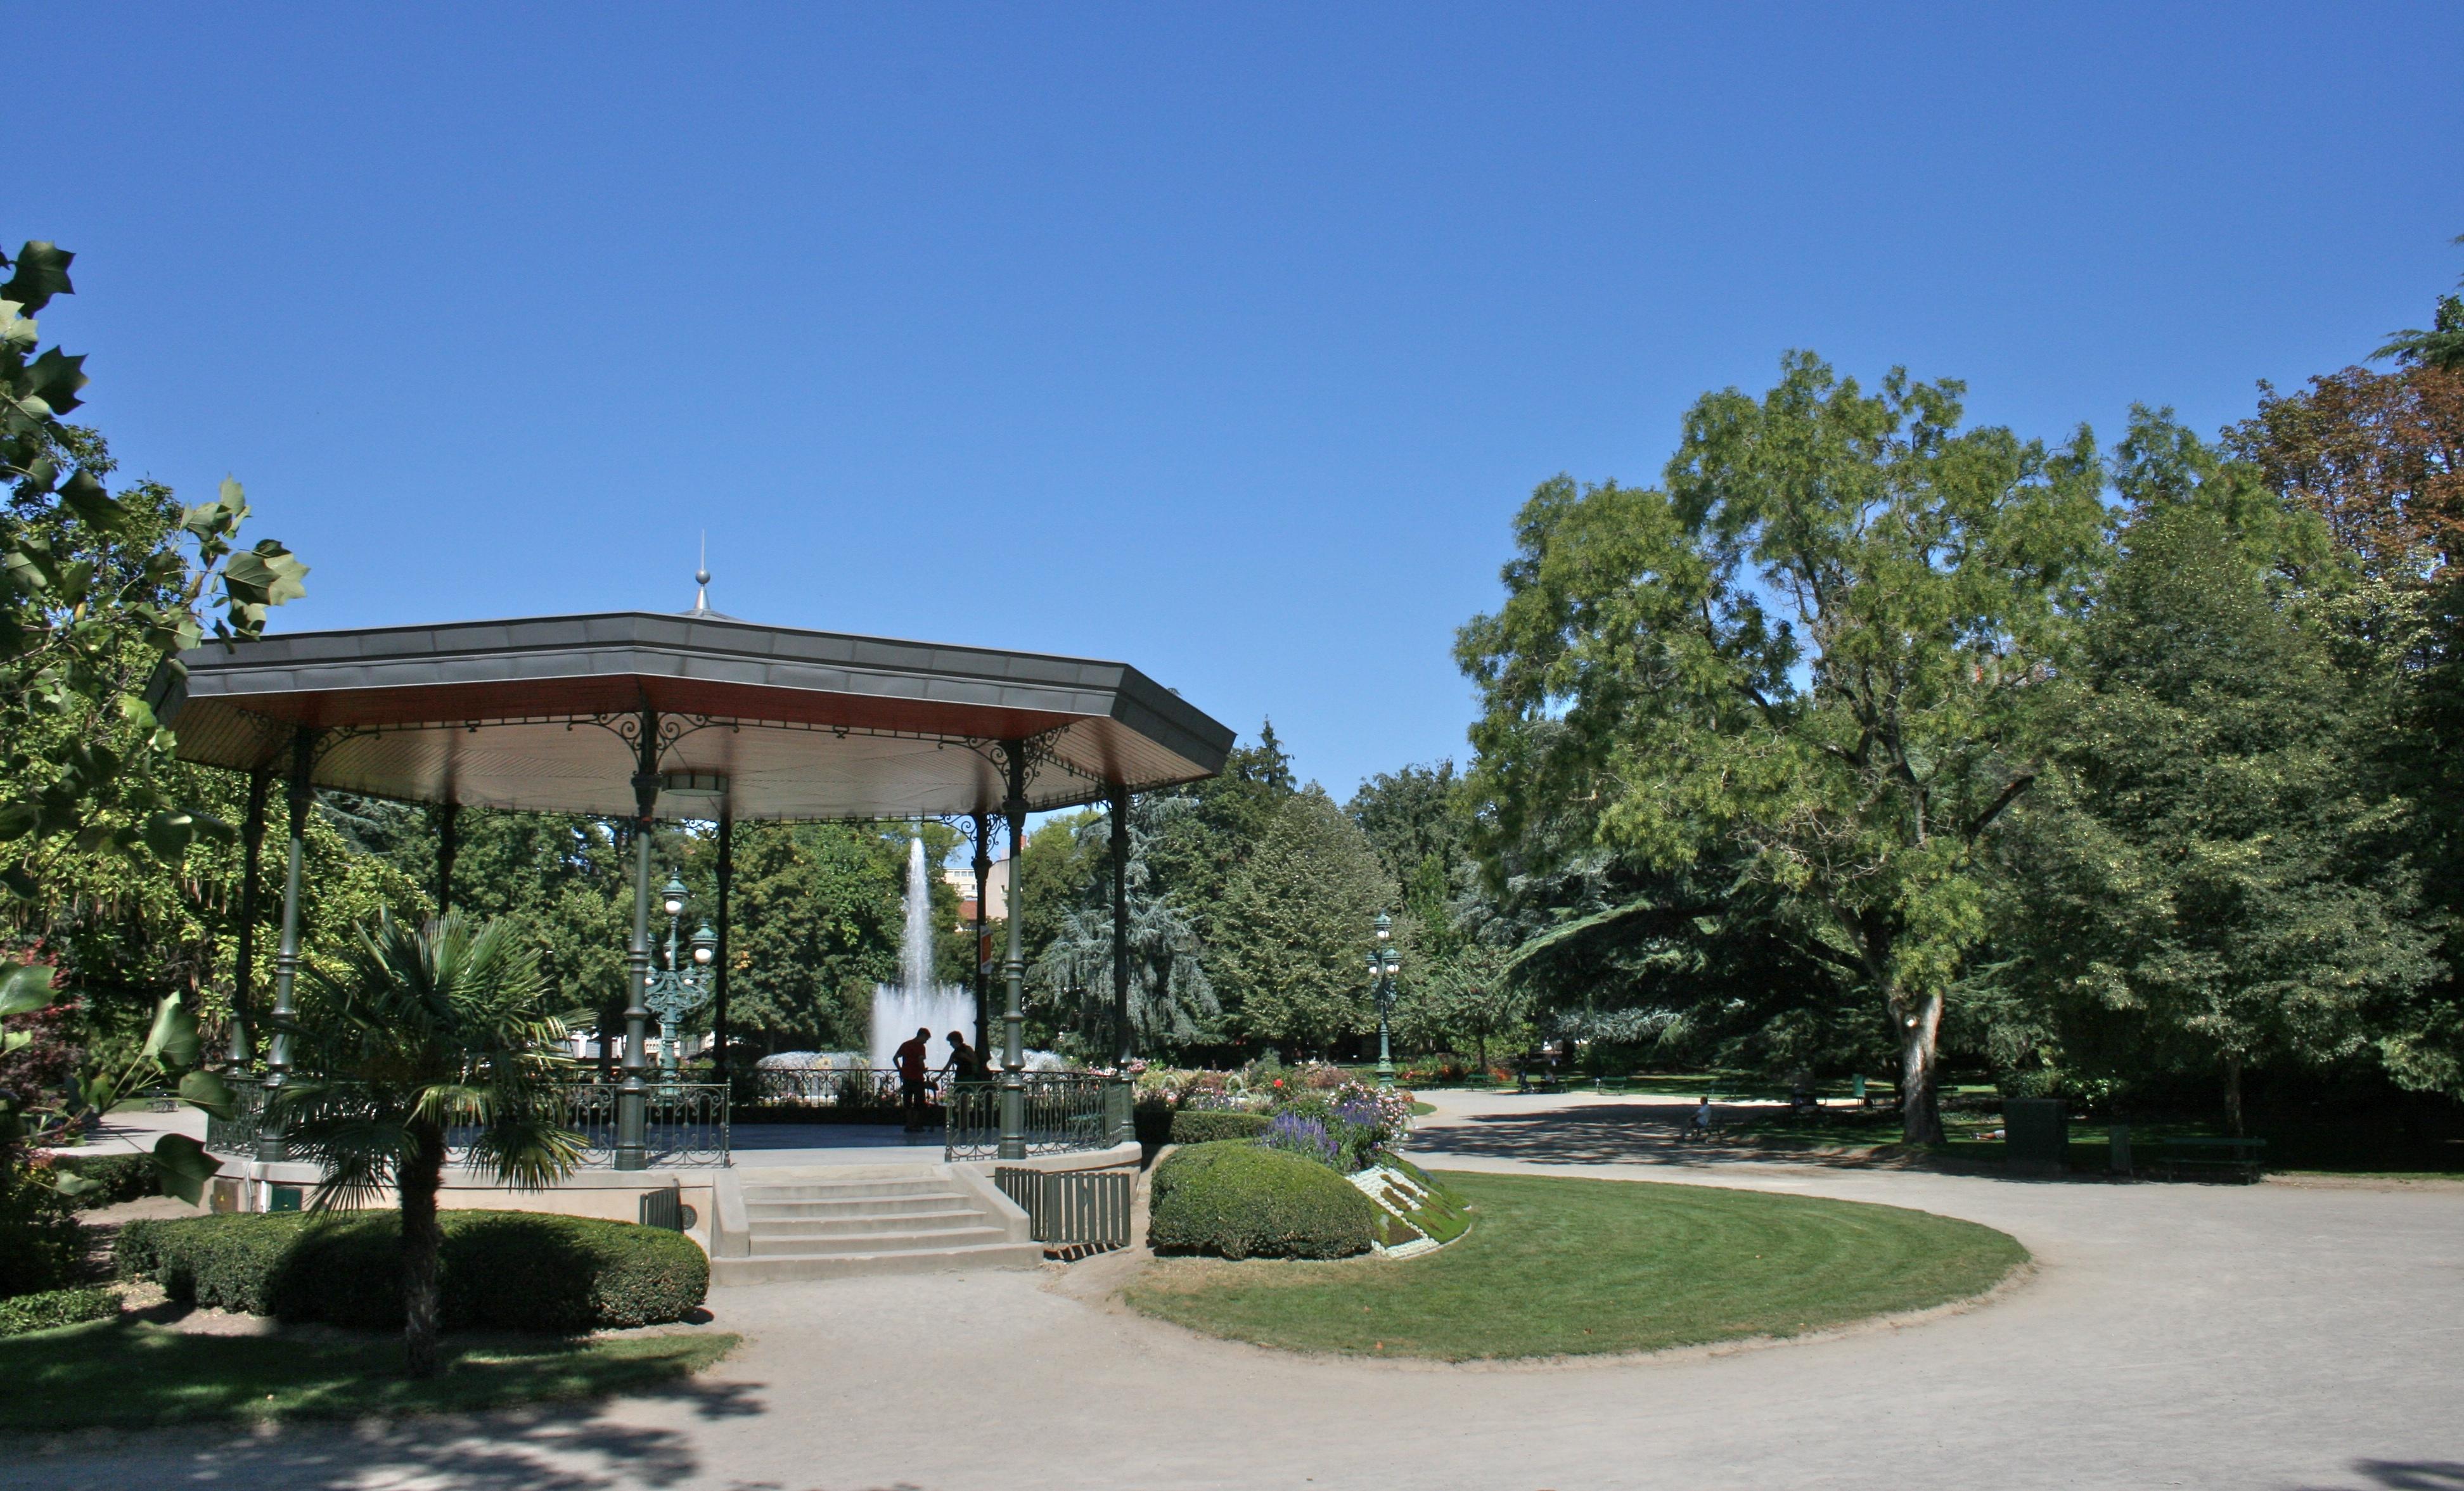 File Bandstand In Jardin Des Plantes Toulouse